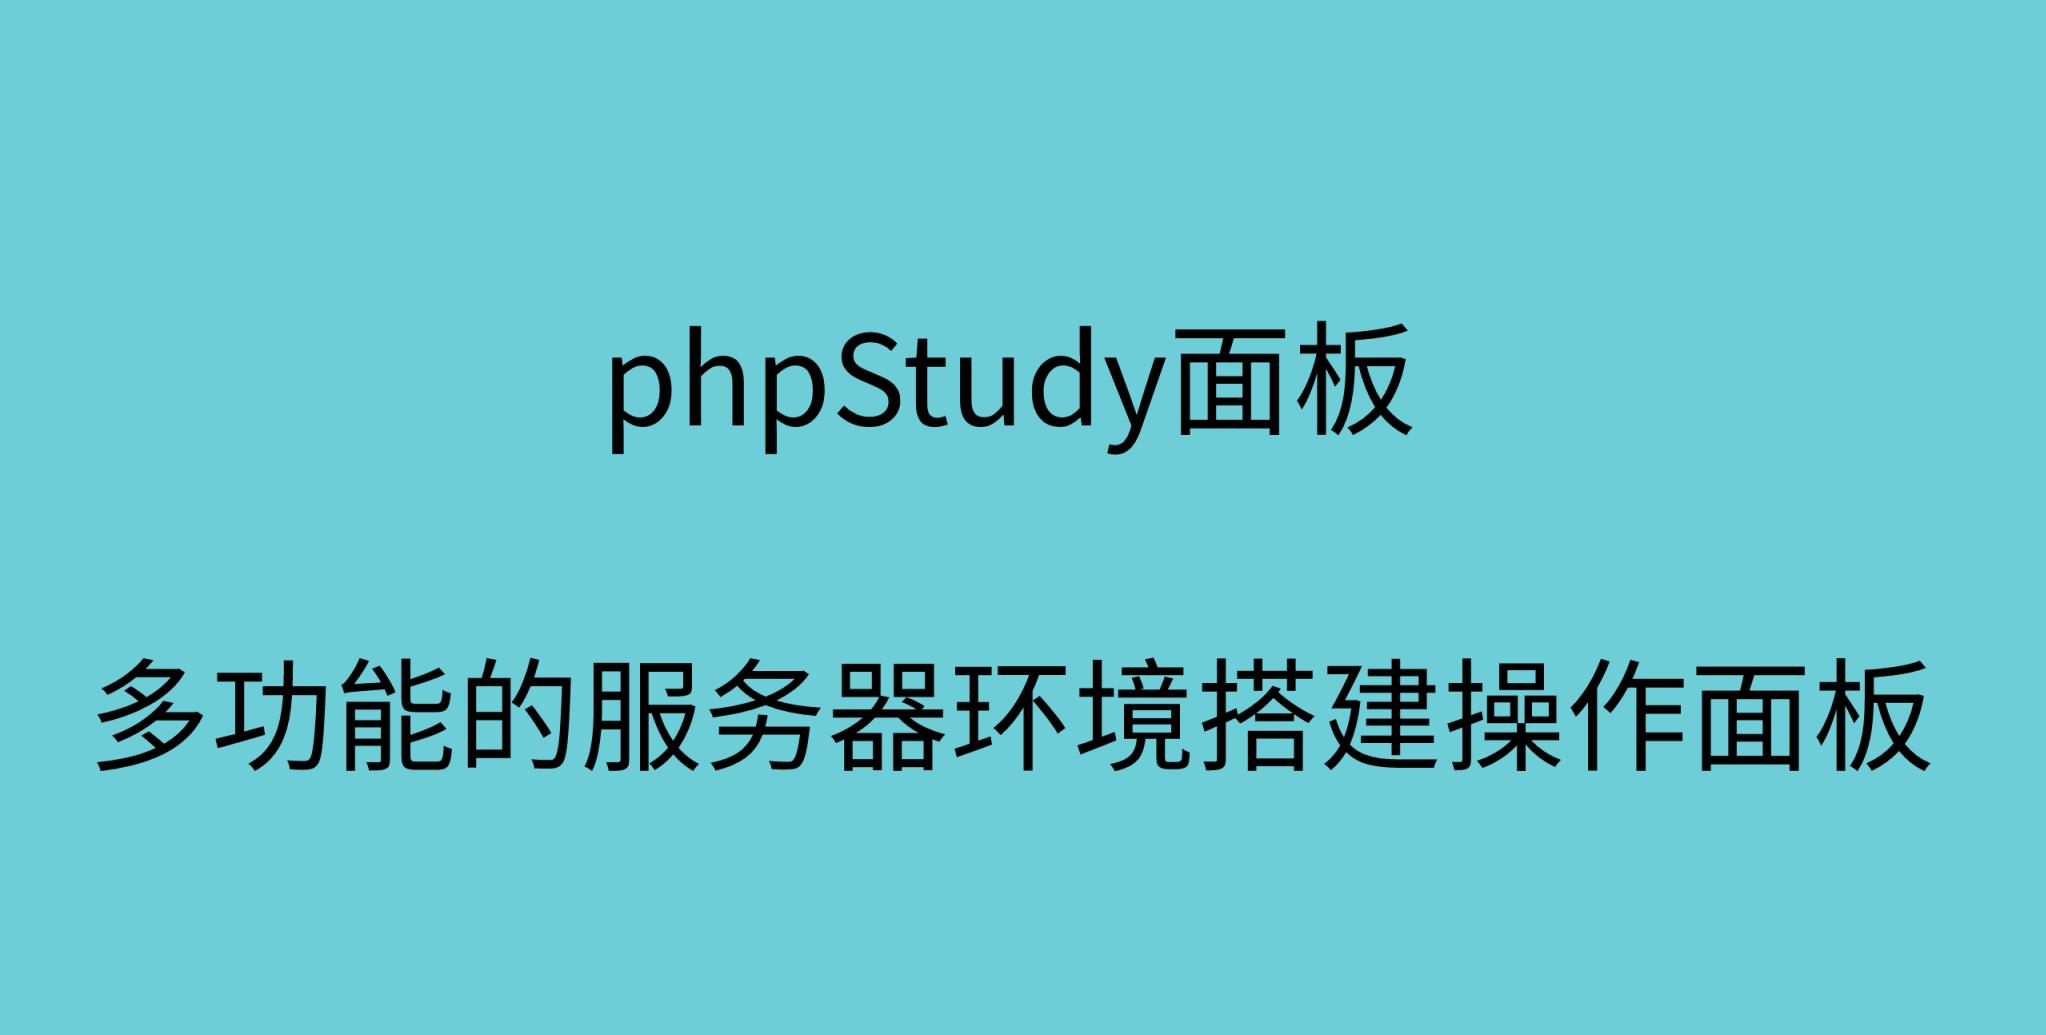 phpStudy面板:多功能的服务器环境搭建操作面板